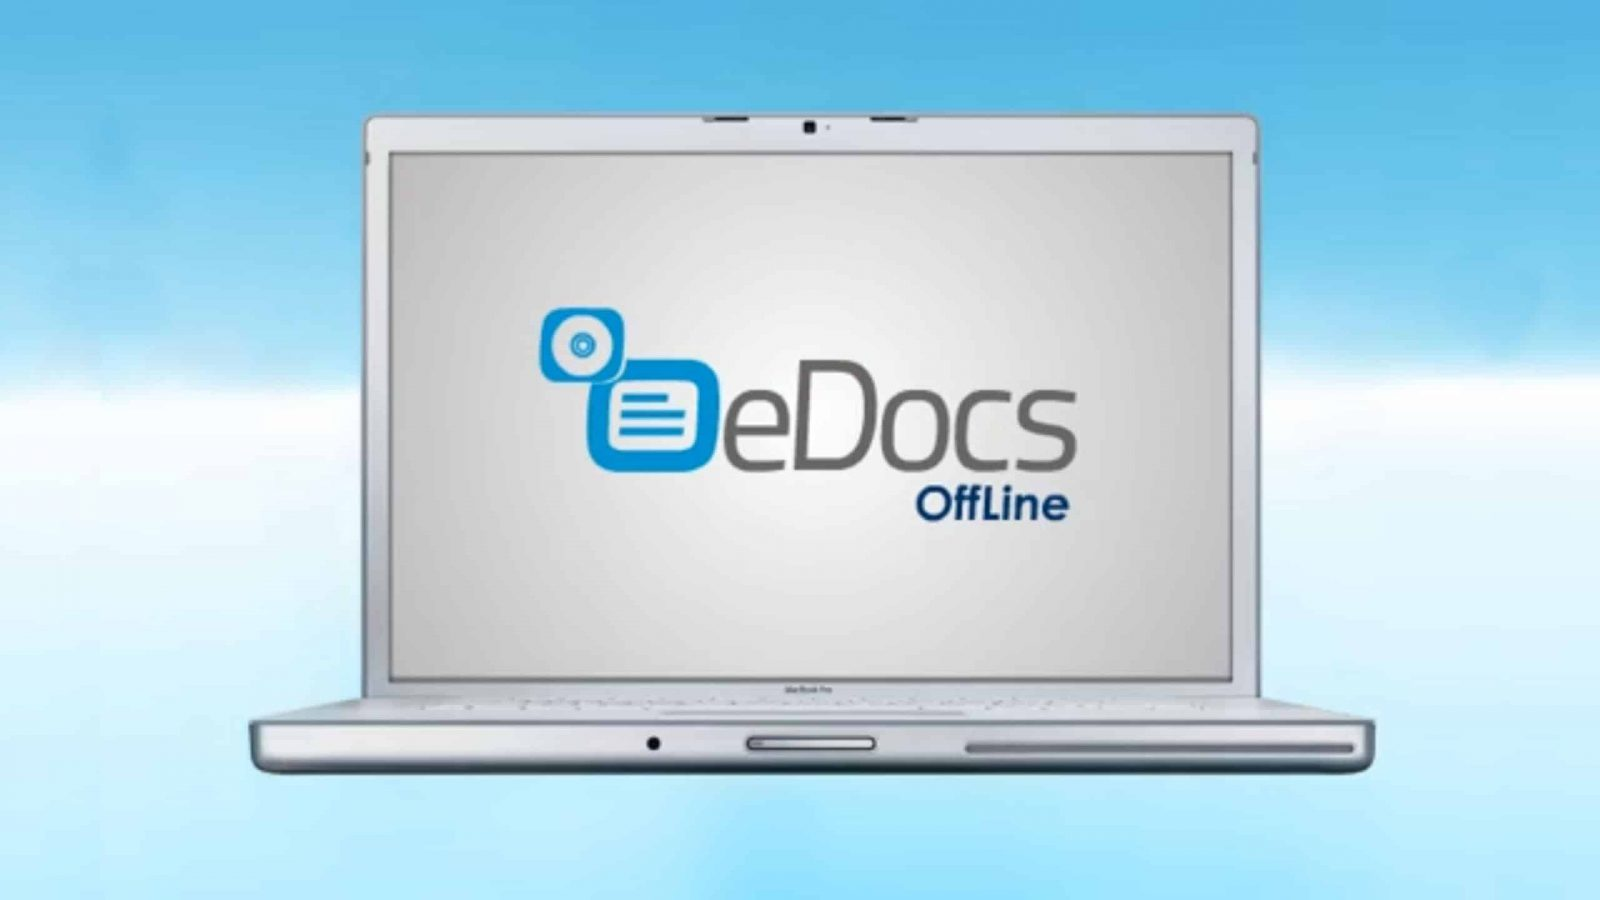 Web3D - מיתוג עסקי - edocs - סרטוני תדמית